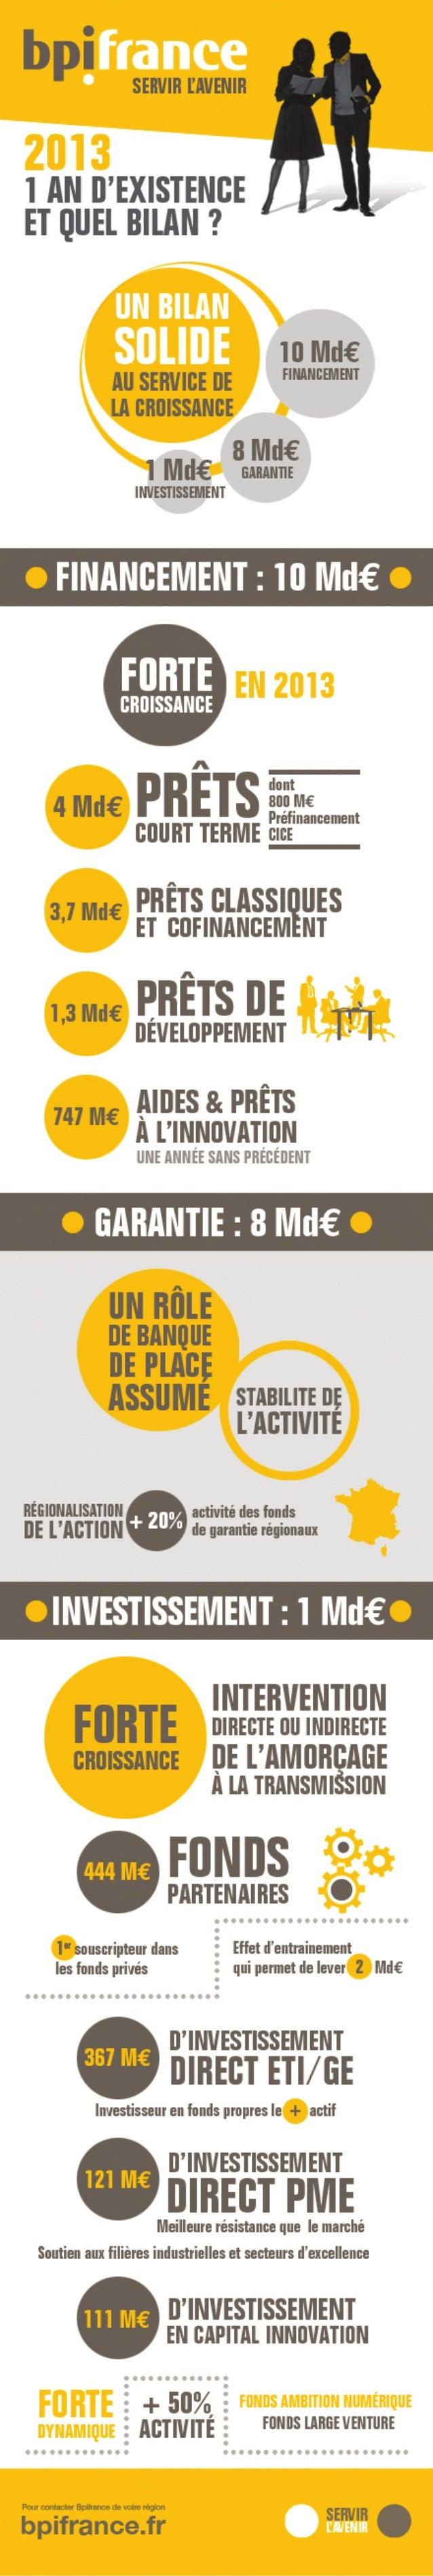 Infographie : Bilan 2013 de Bpifrance